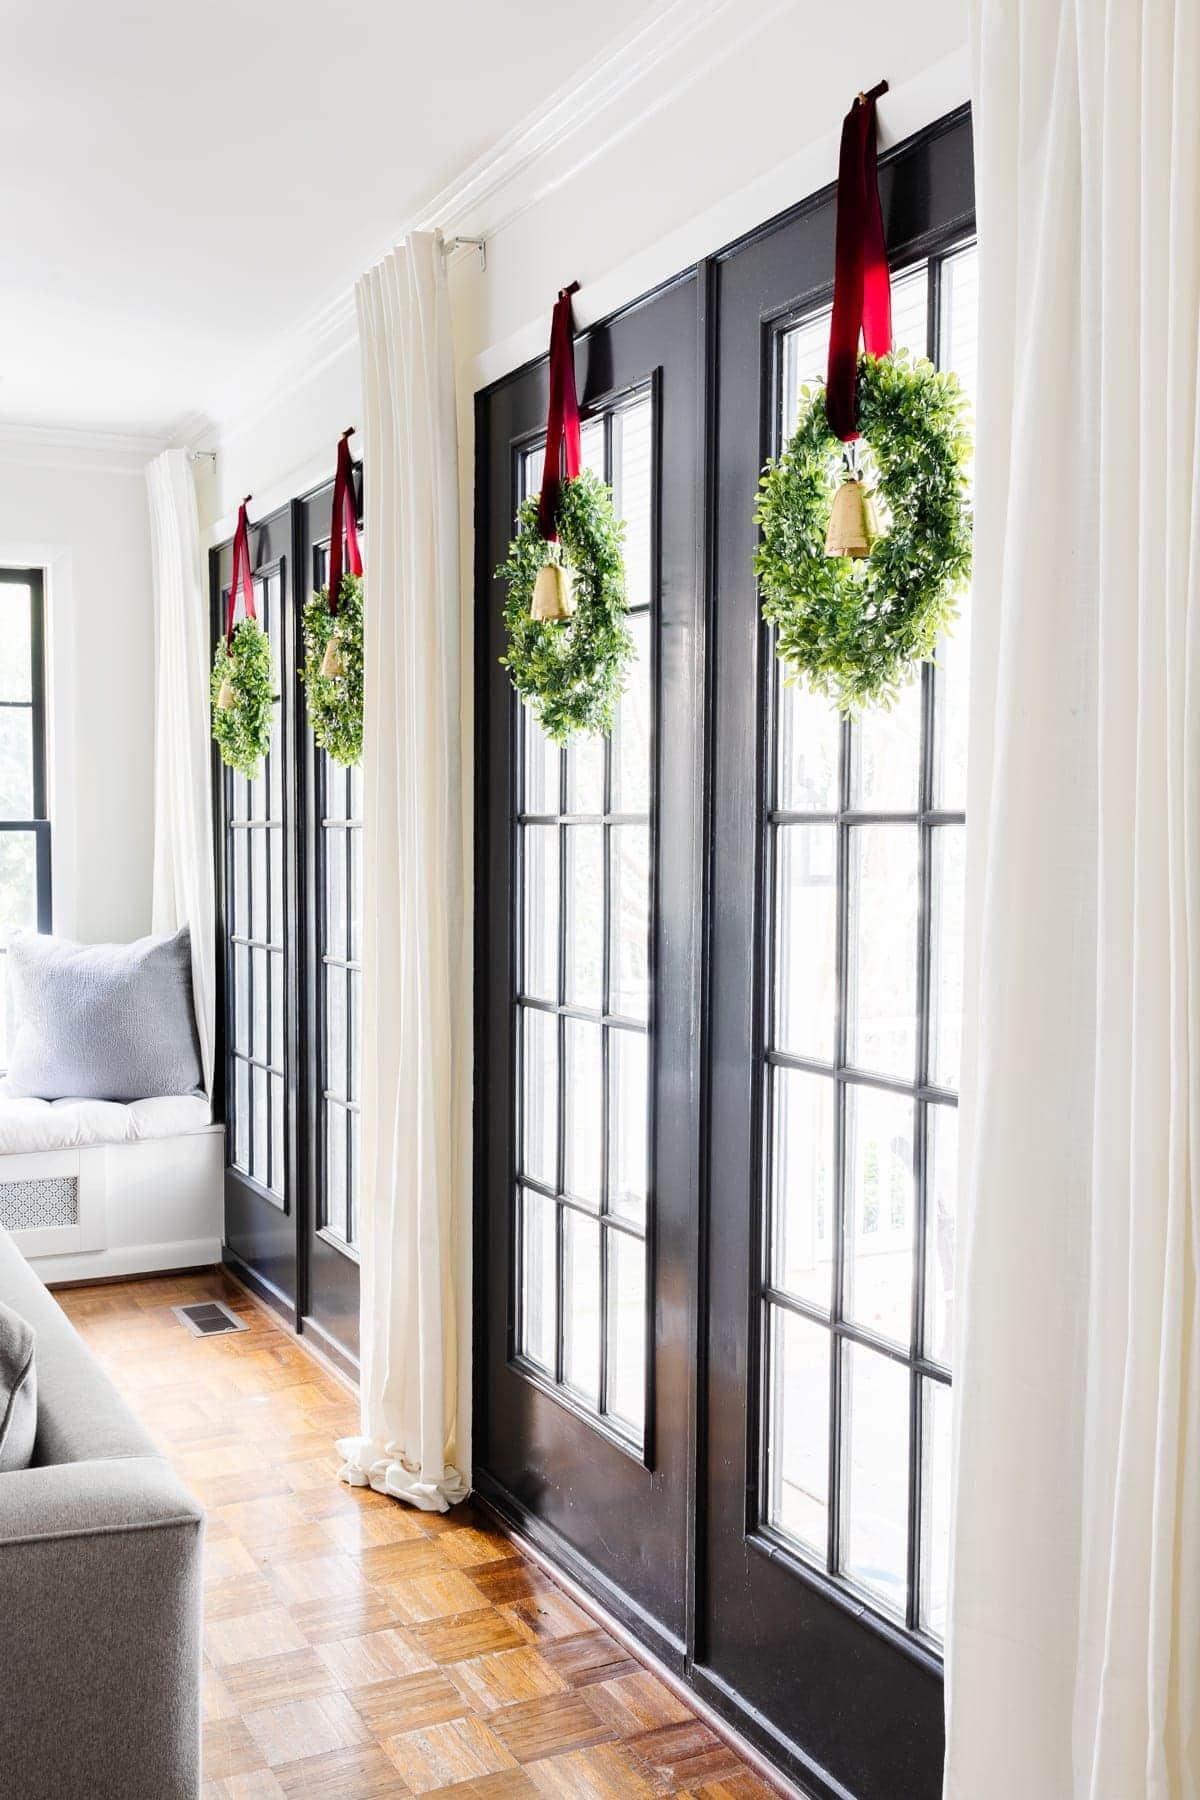 Christmas wreaths hanging on French door windows